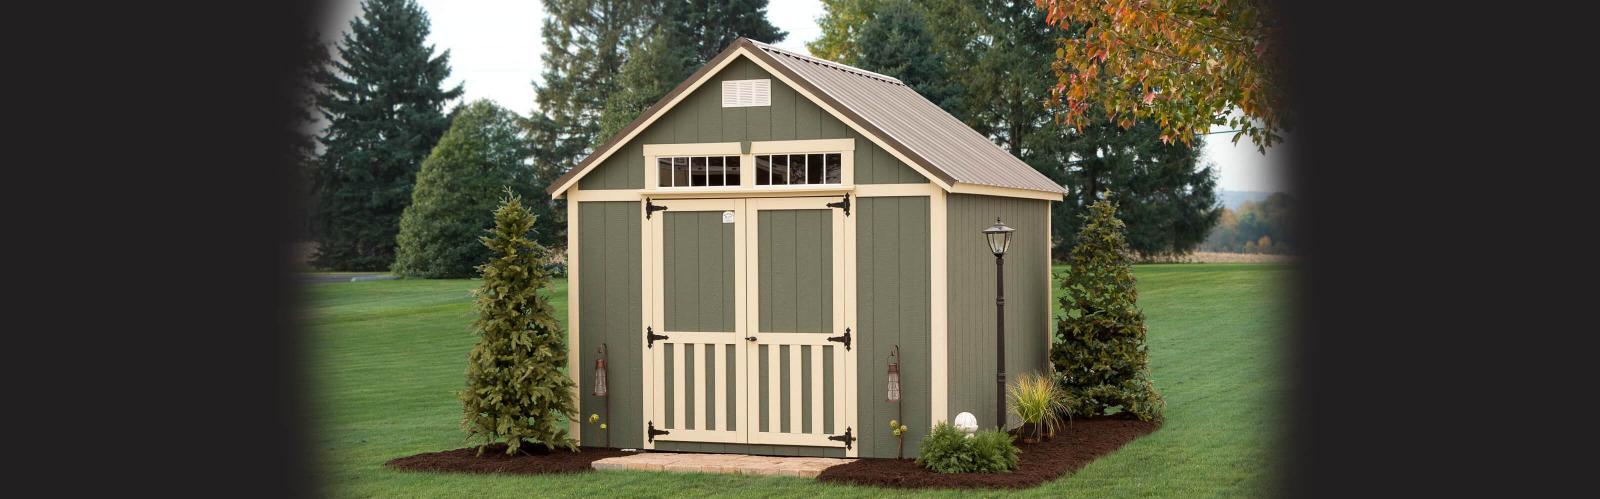 Amish backyard storage shed